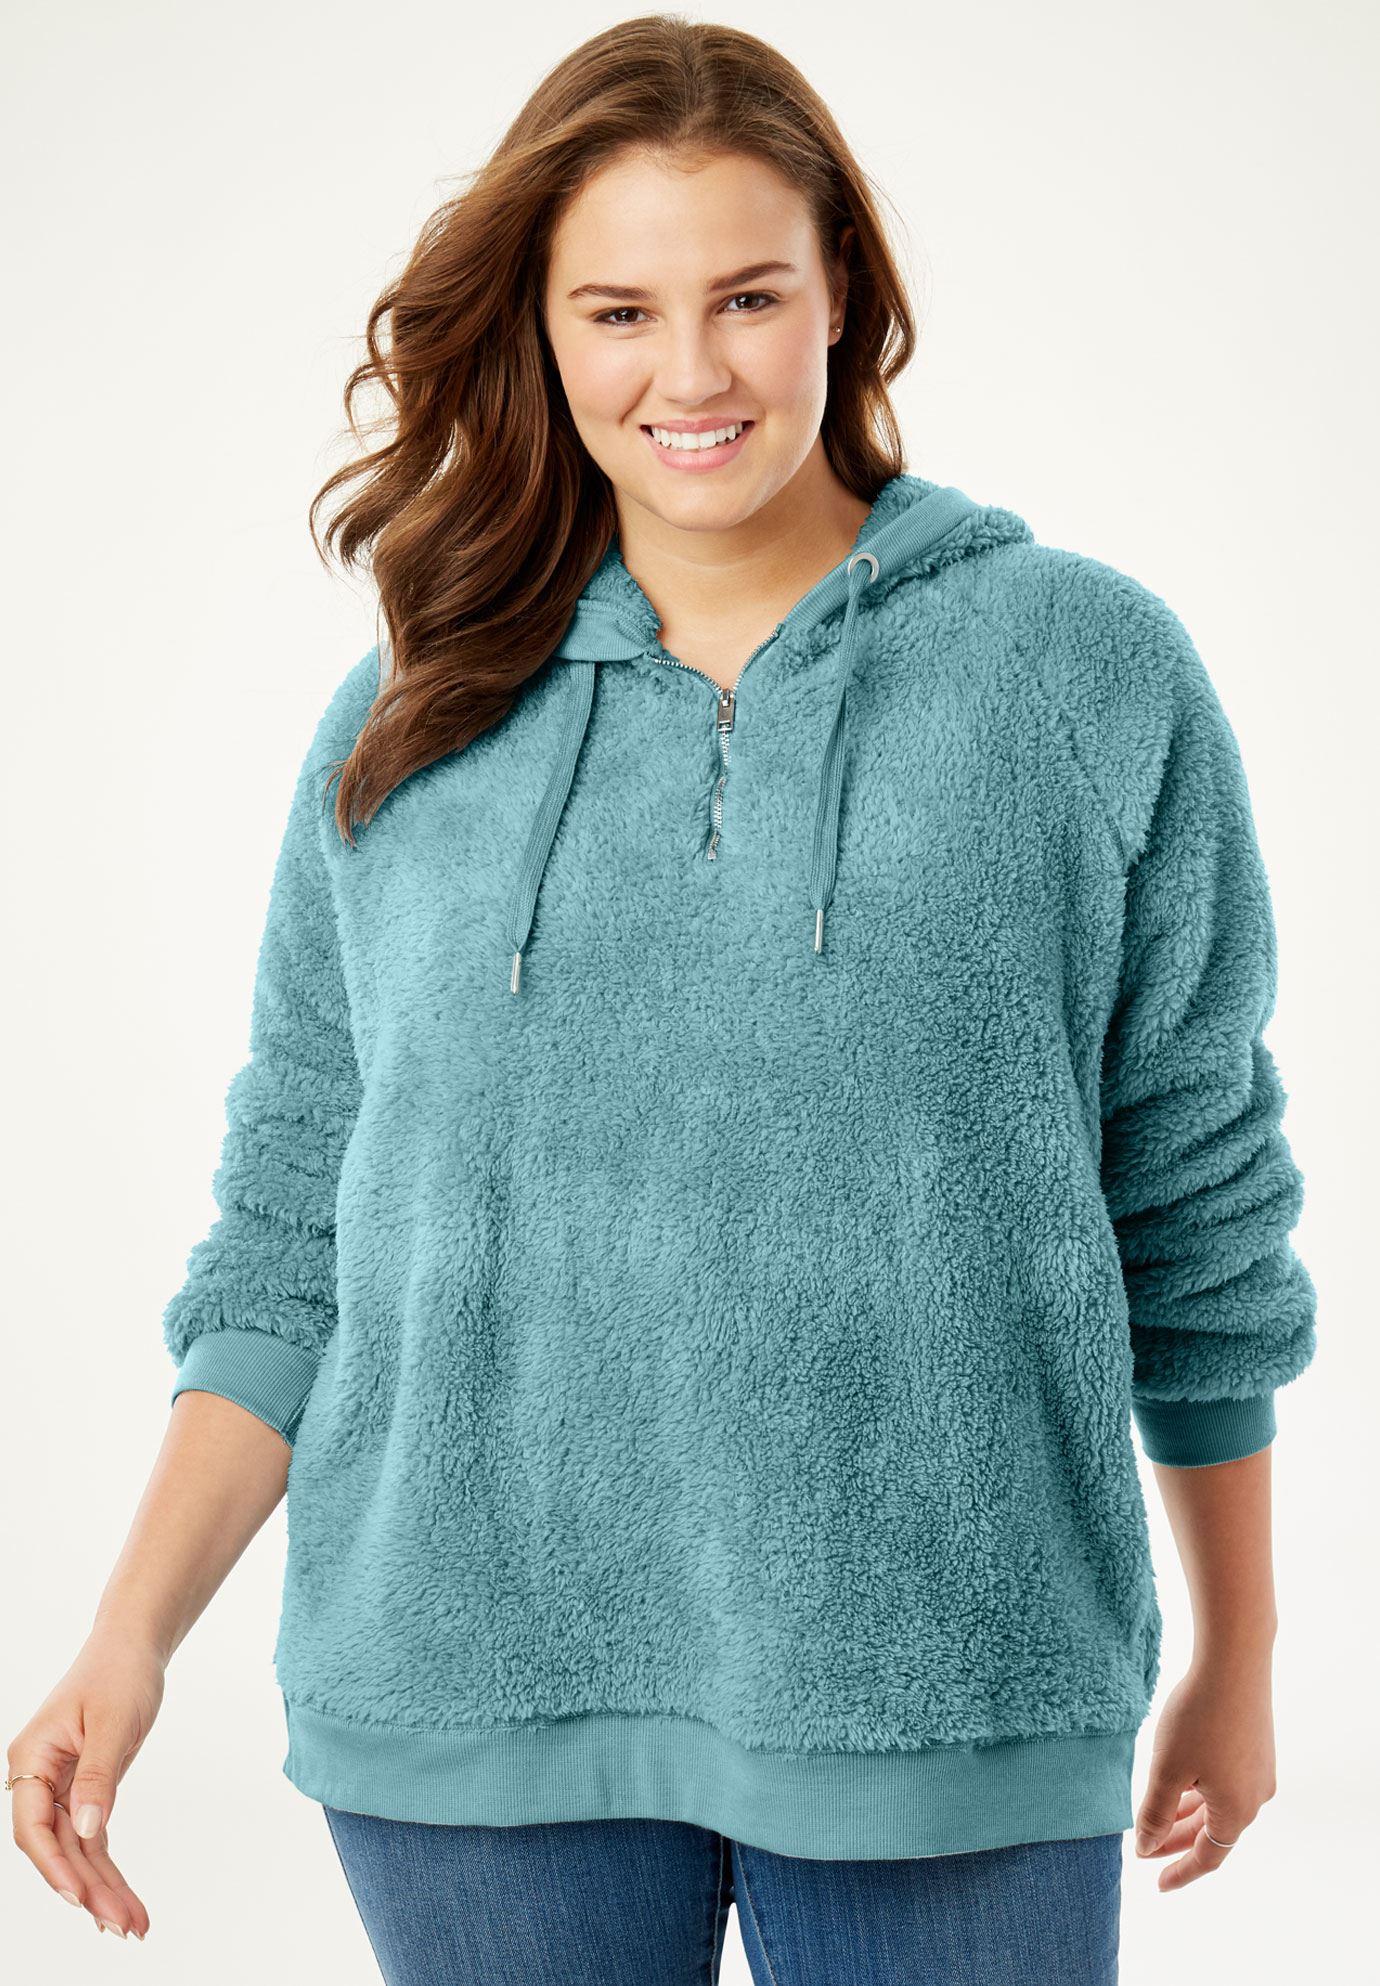 abcdb145b0258 Quarter-Zip Sherpa Fleece Hoodie Sweatshirt| Plus Size Sweatshirts ...